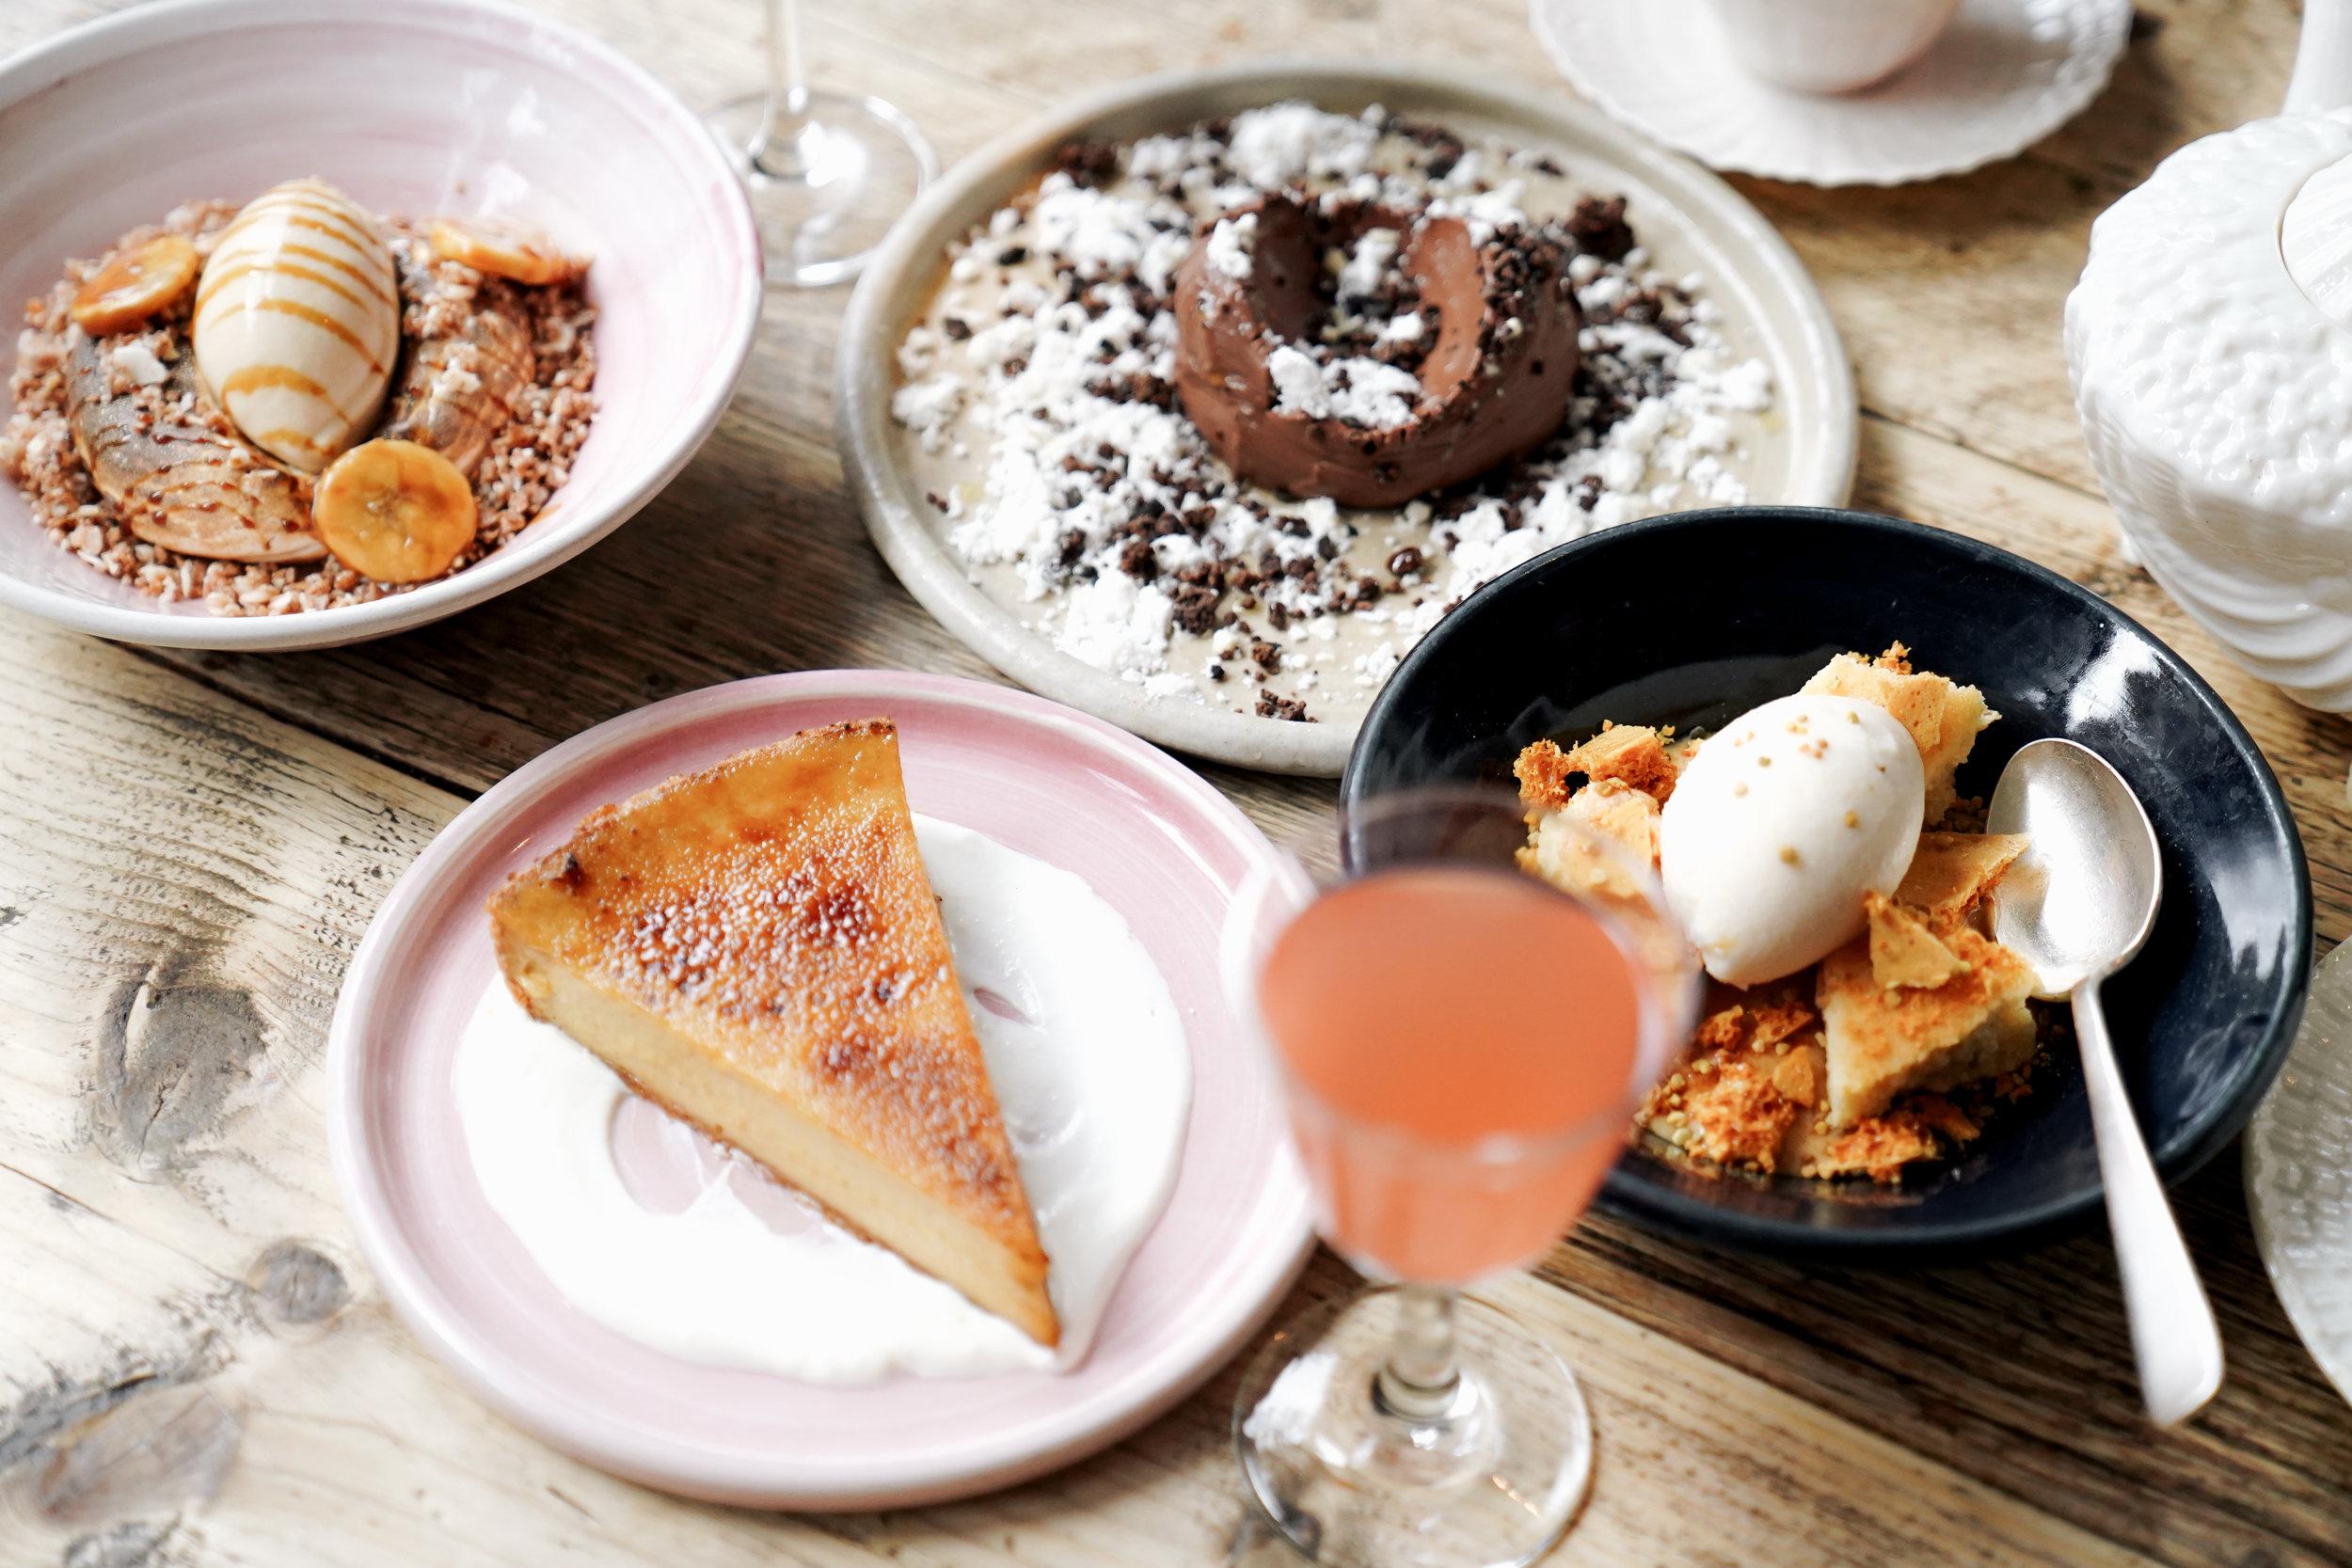 Chicama desserts